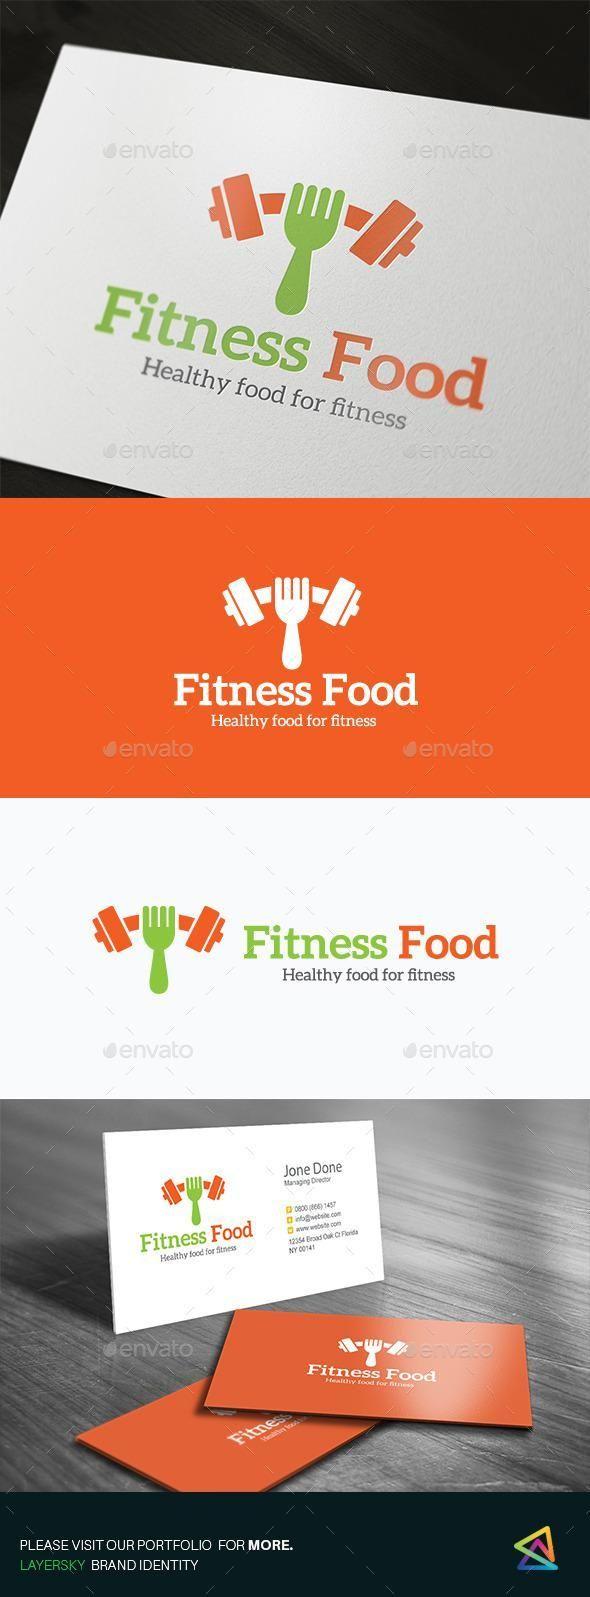 Easy fitness logo #fitness | einfaches fitness-logo | logo de fitness facile | logotipo de fitness f...